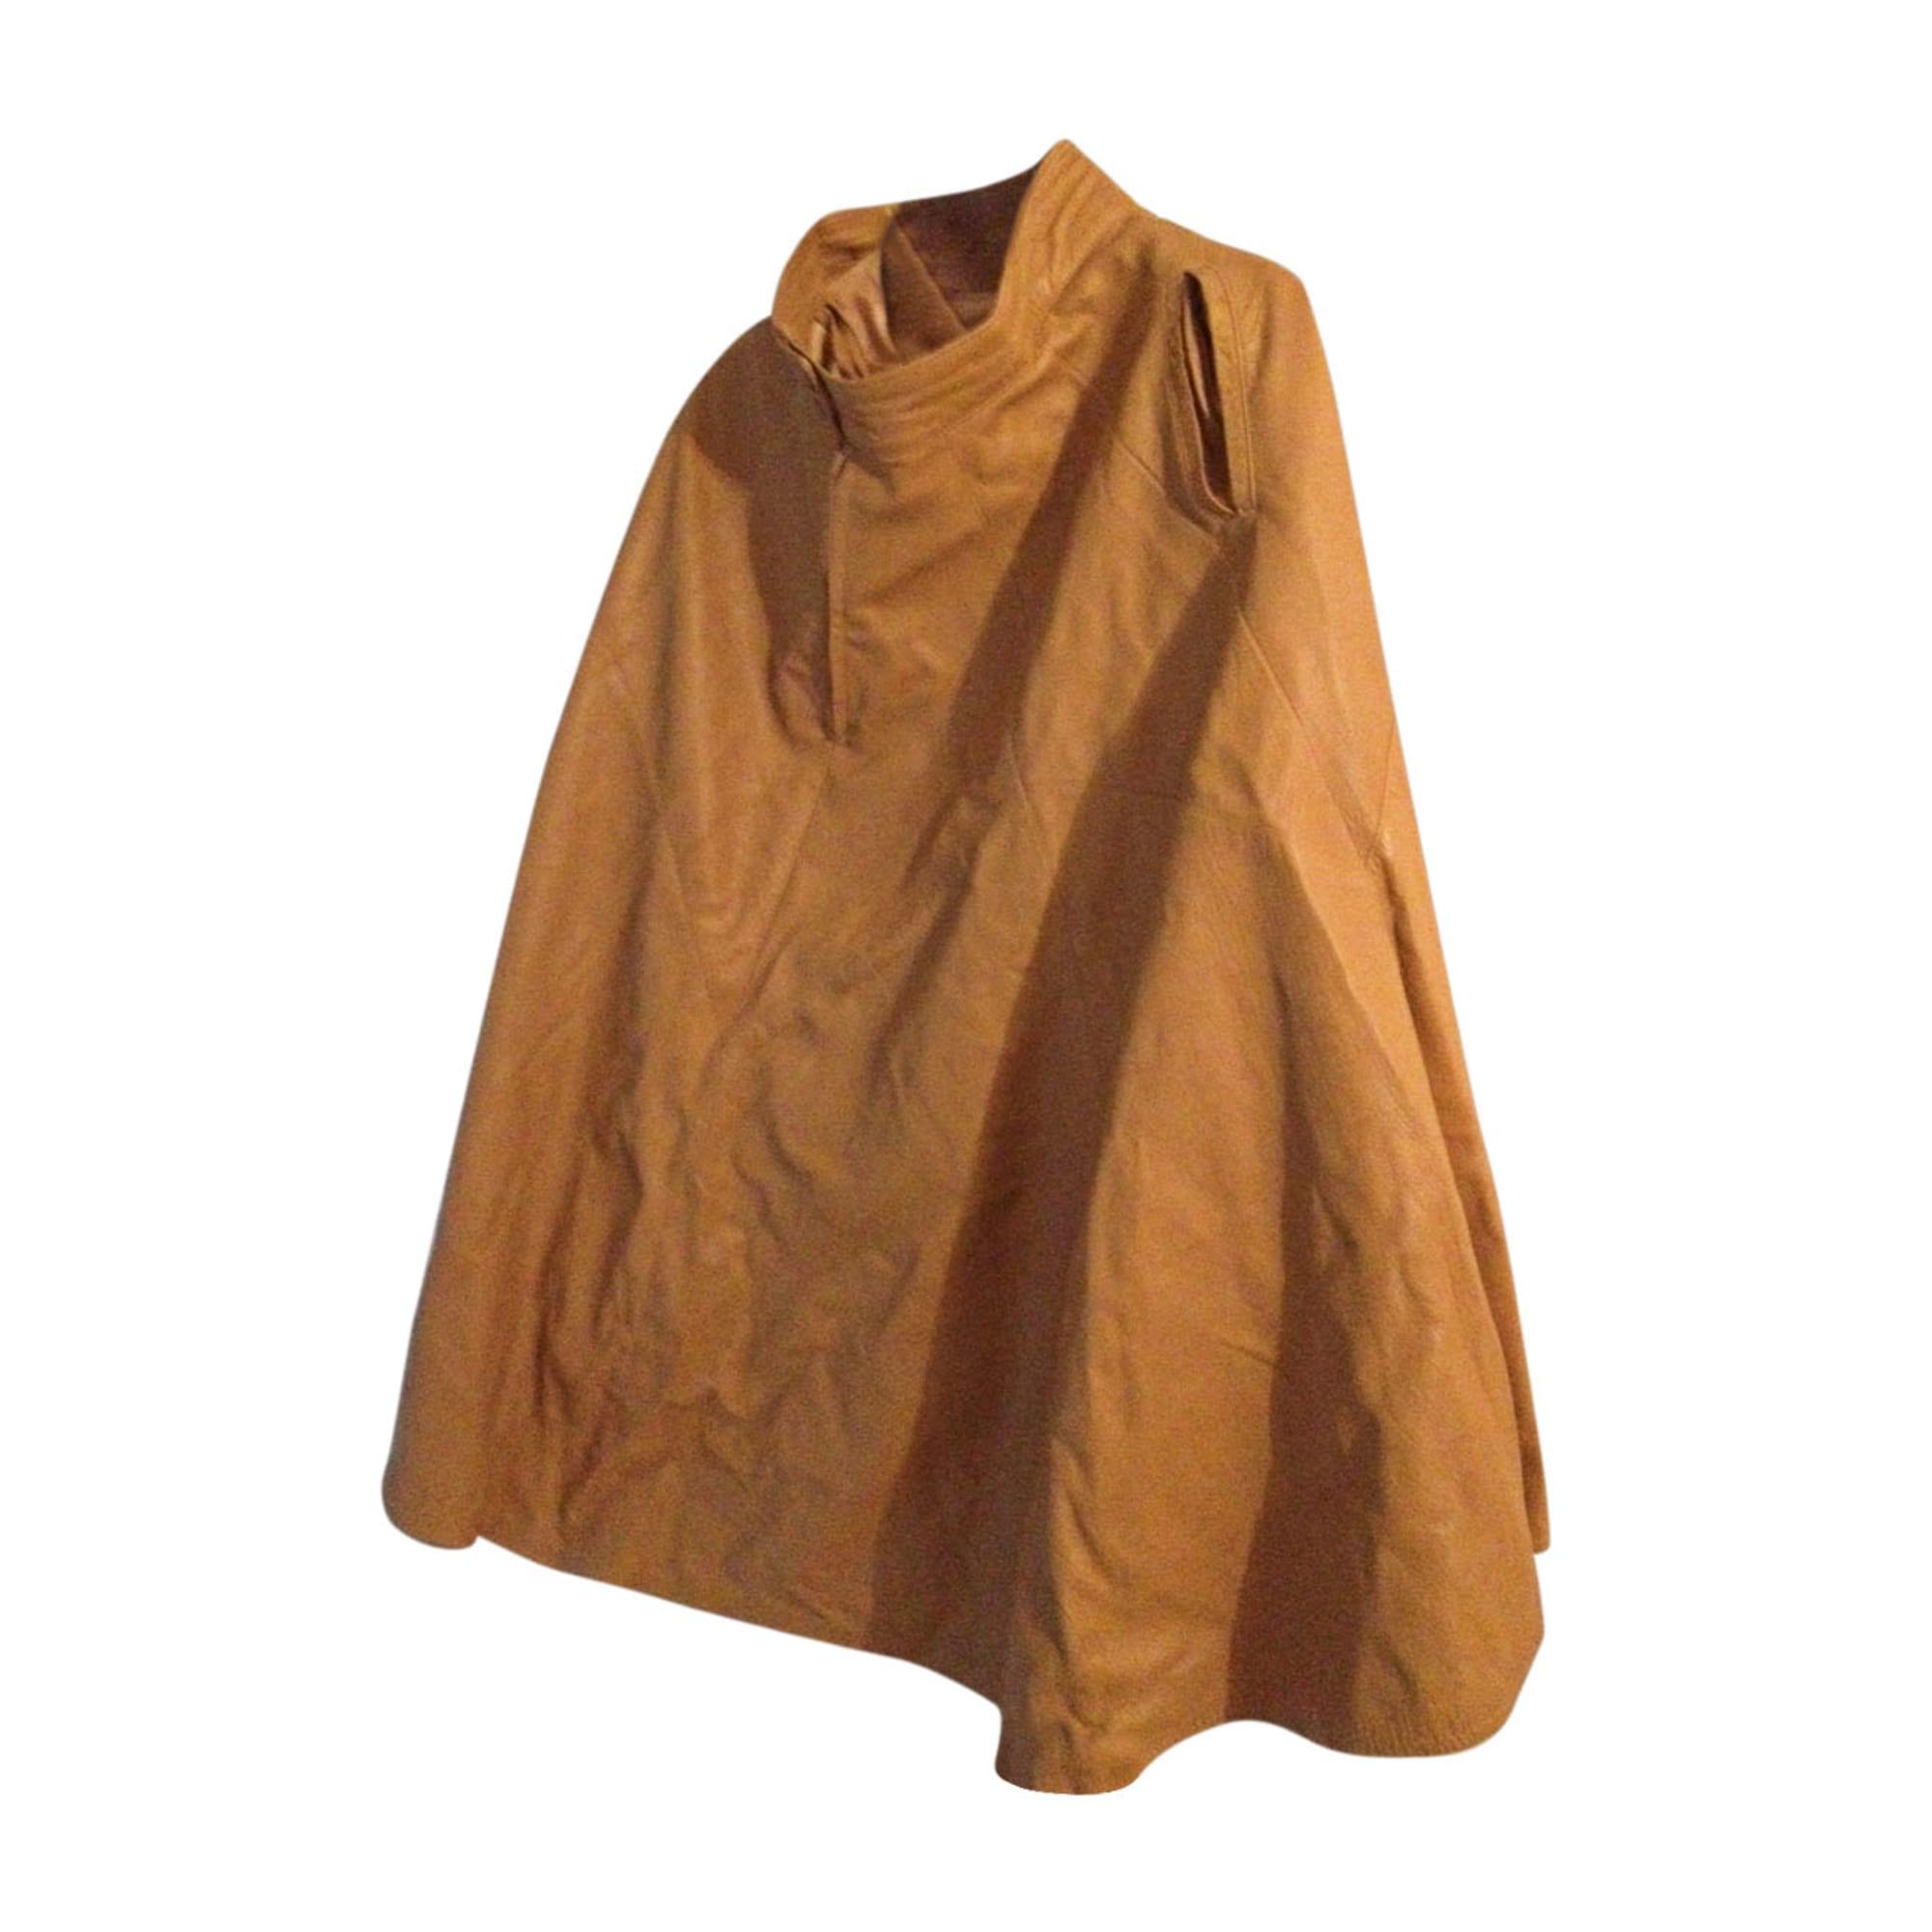 Veste en cuir JITROIS Beige, camel